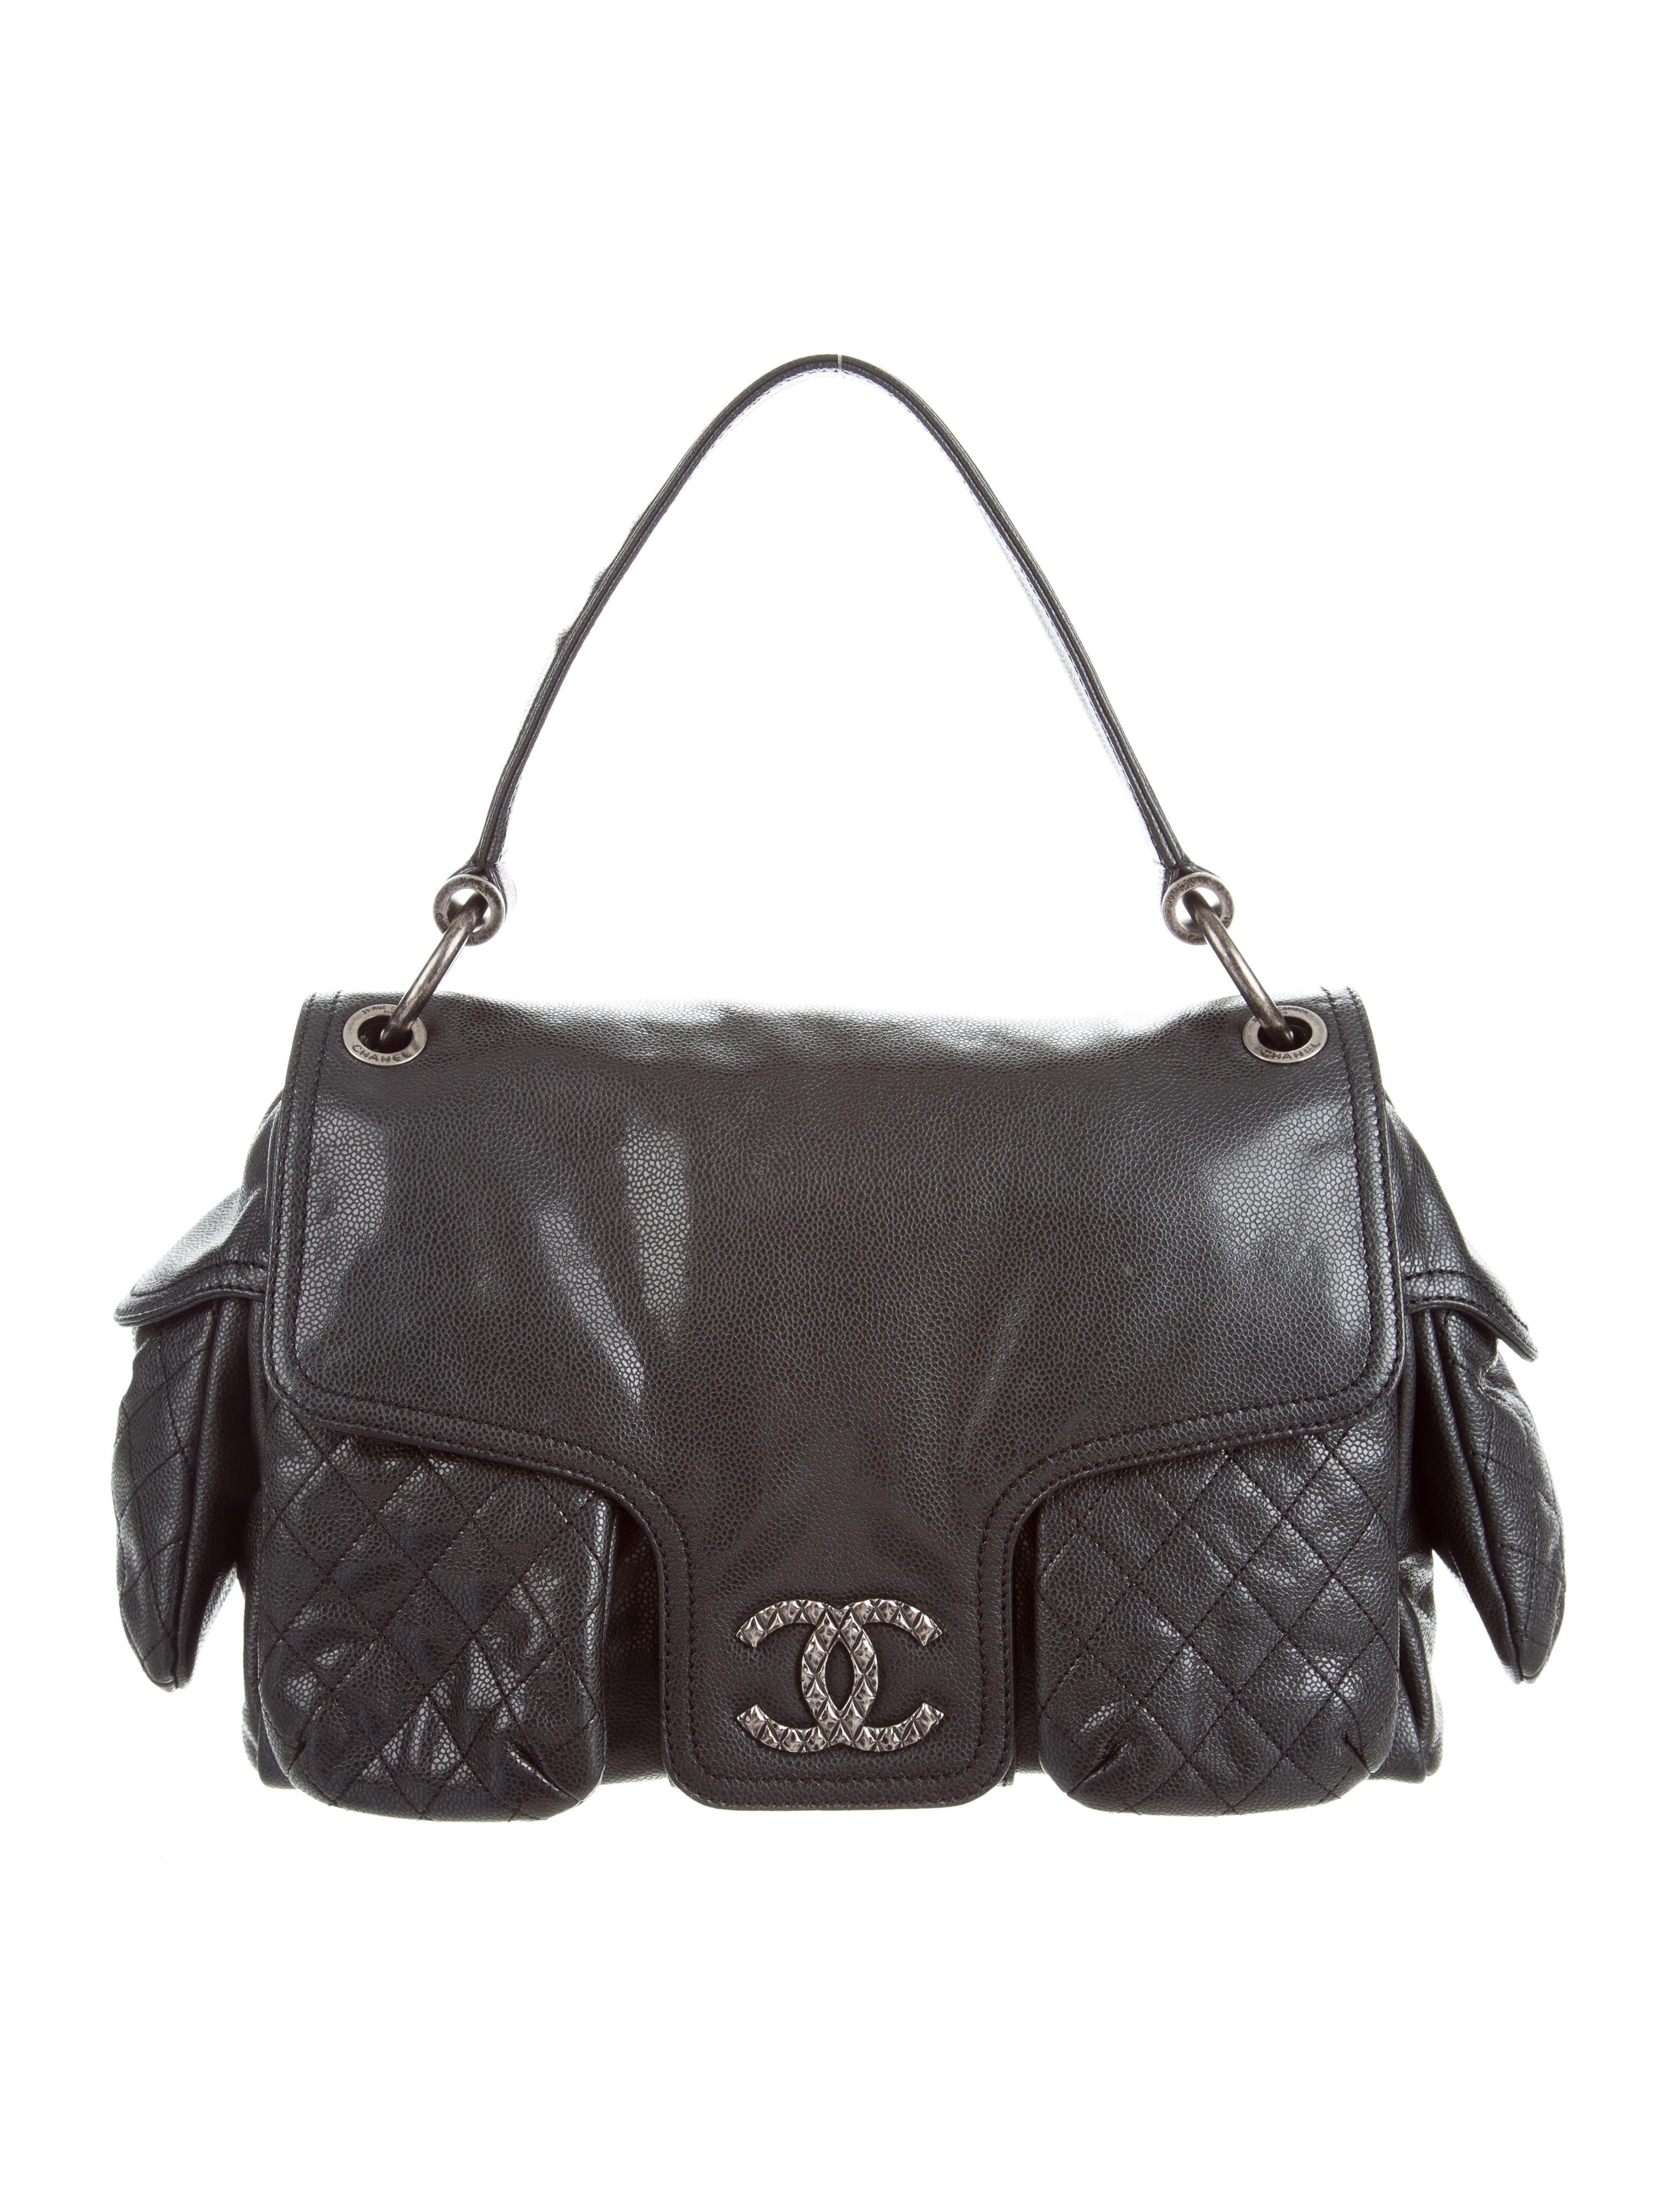 c6bda7f7eed679 Chanel Coco Rider Flap Bag - Handbags - CHA178342 | The RealReal